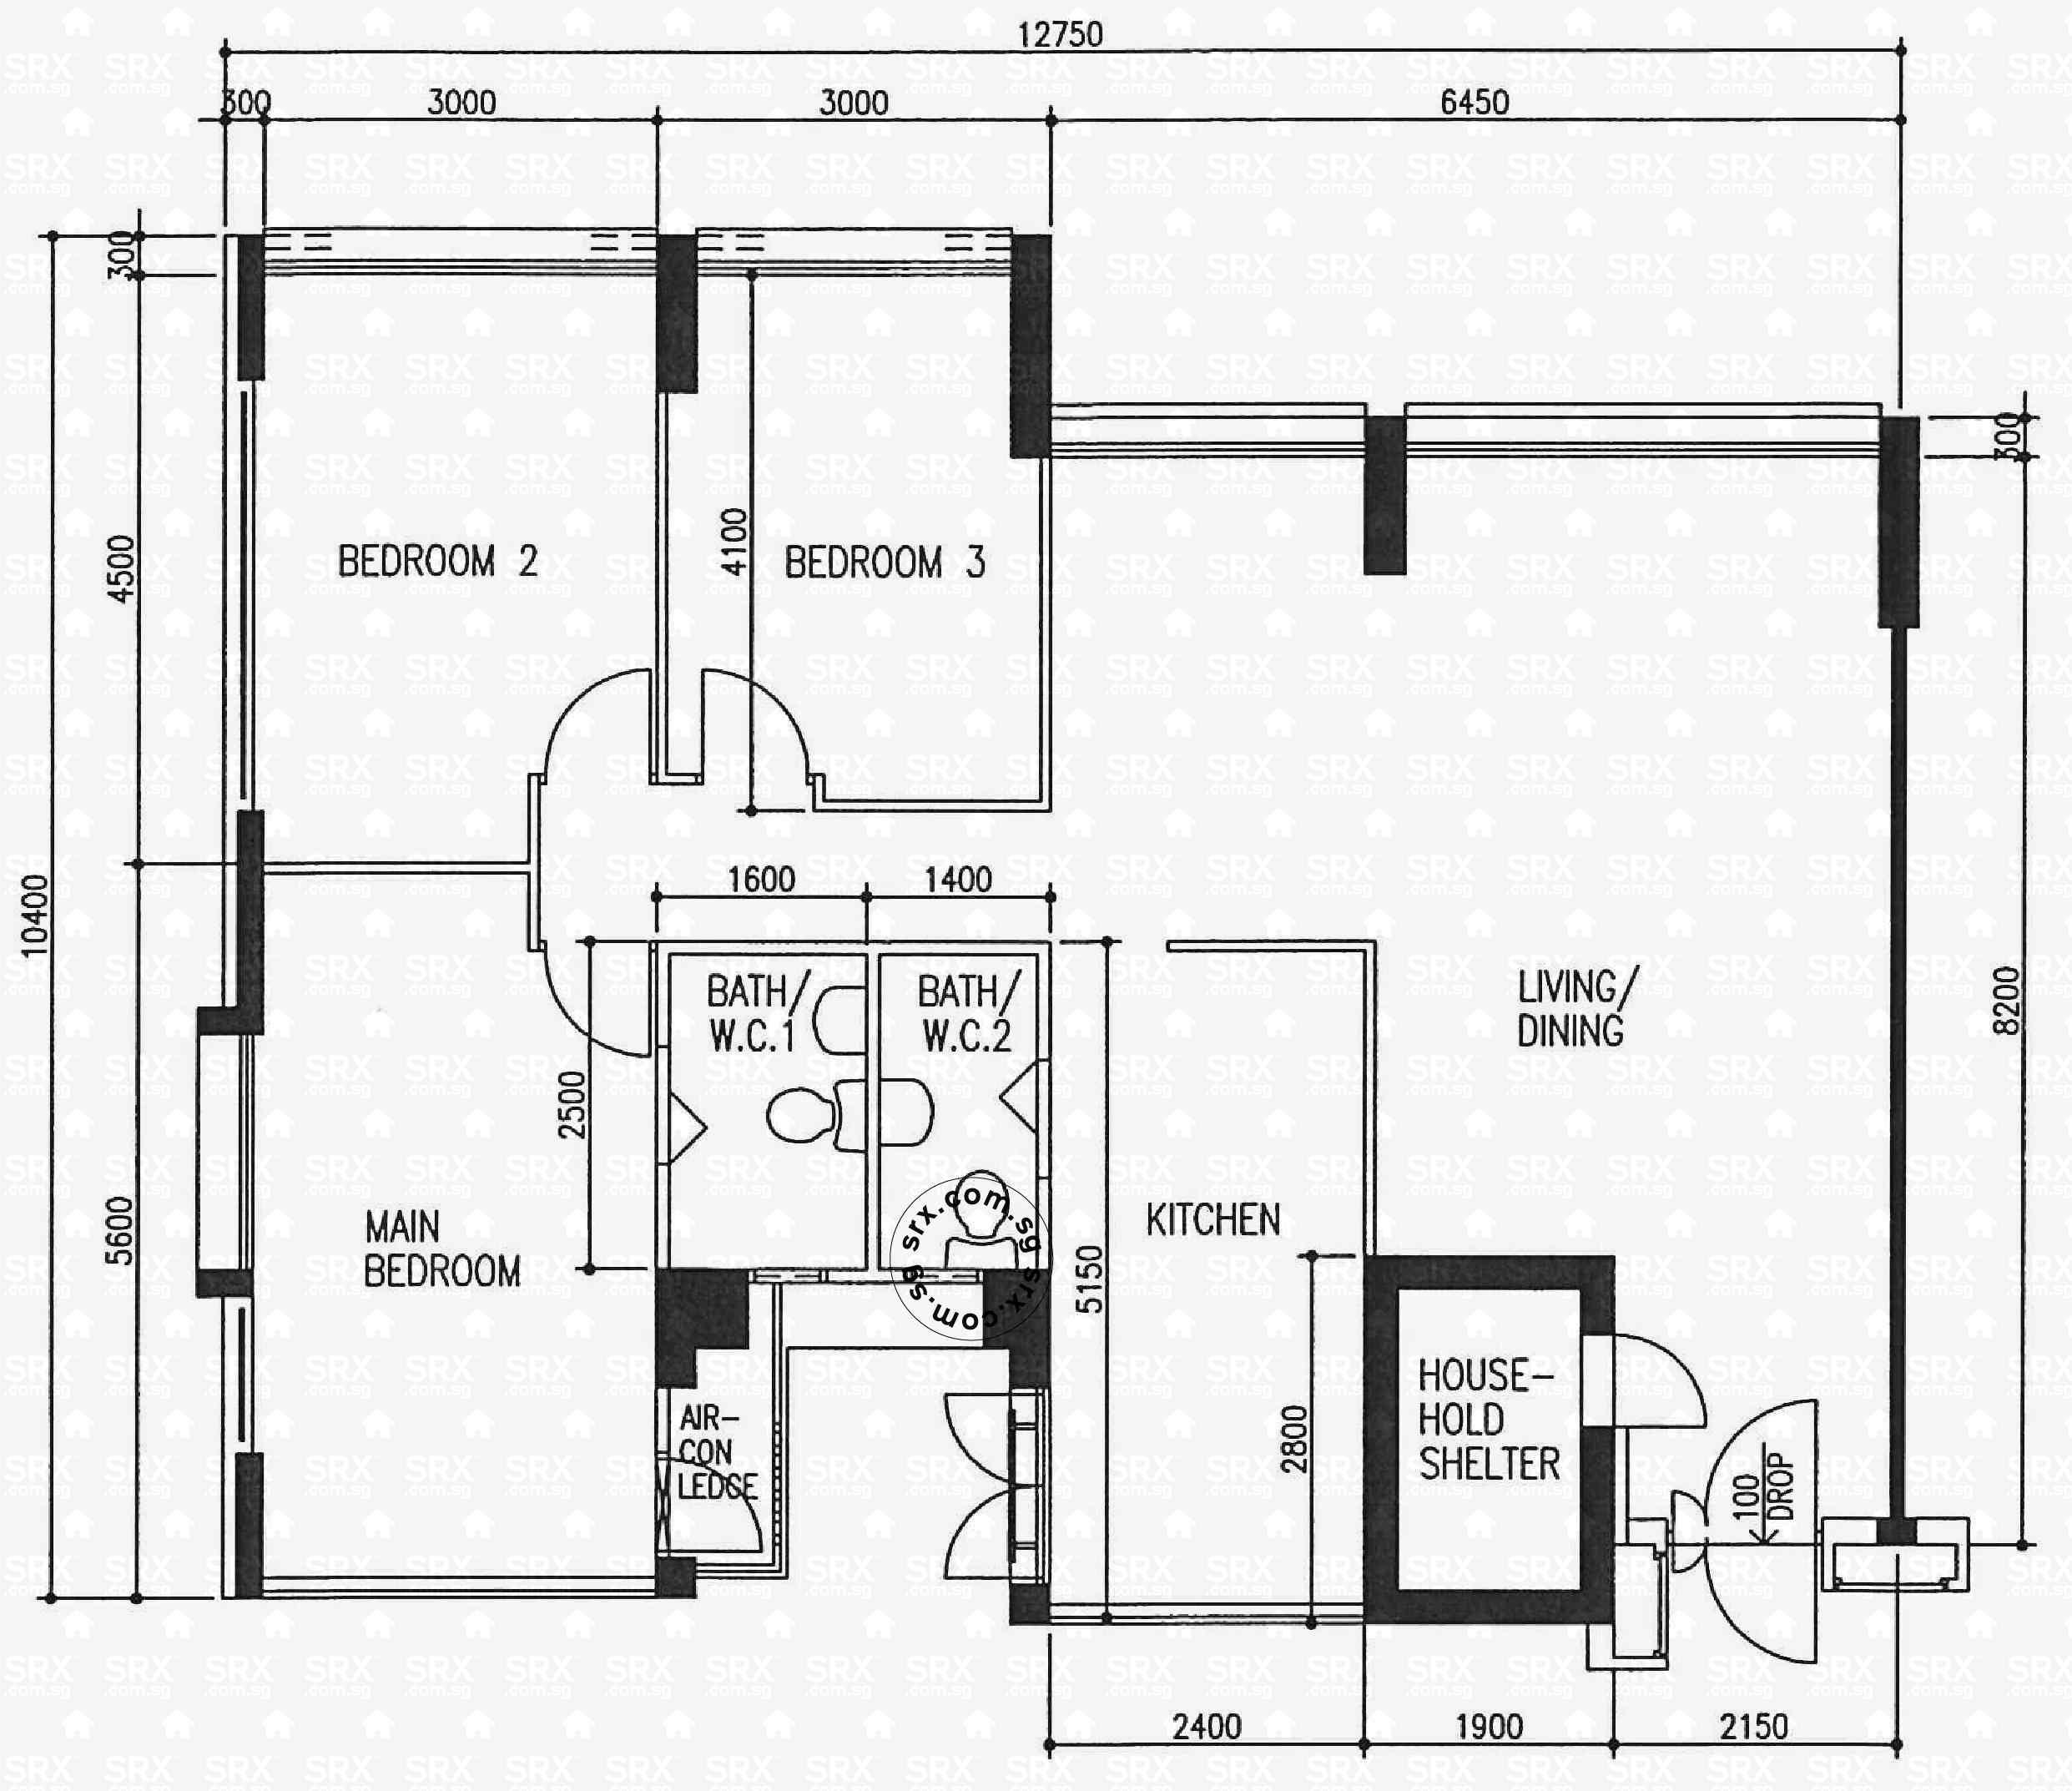 ang mo kio avenue  hdb details  srx property - ang mo kio avenue  floor plan image